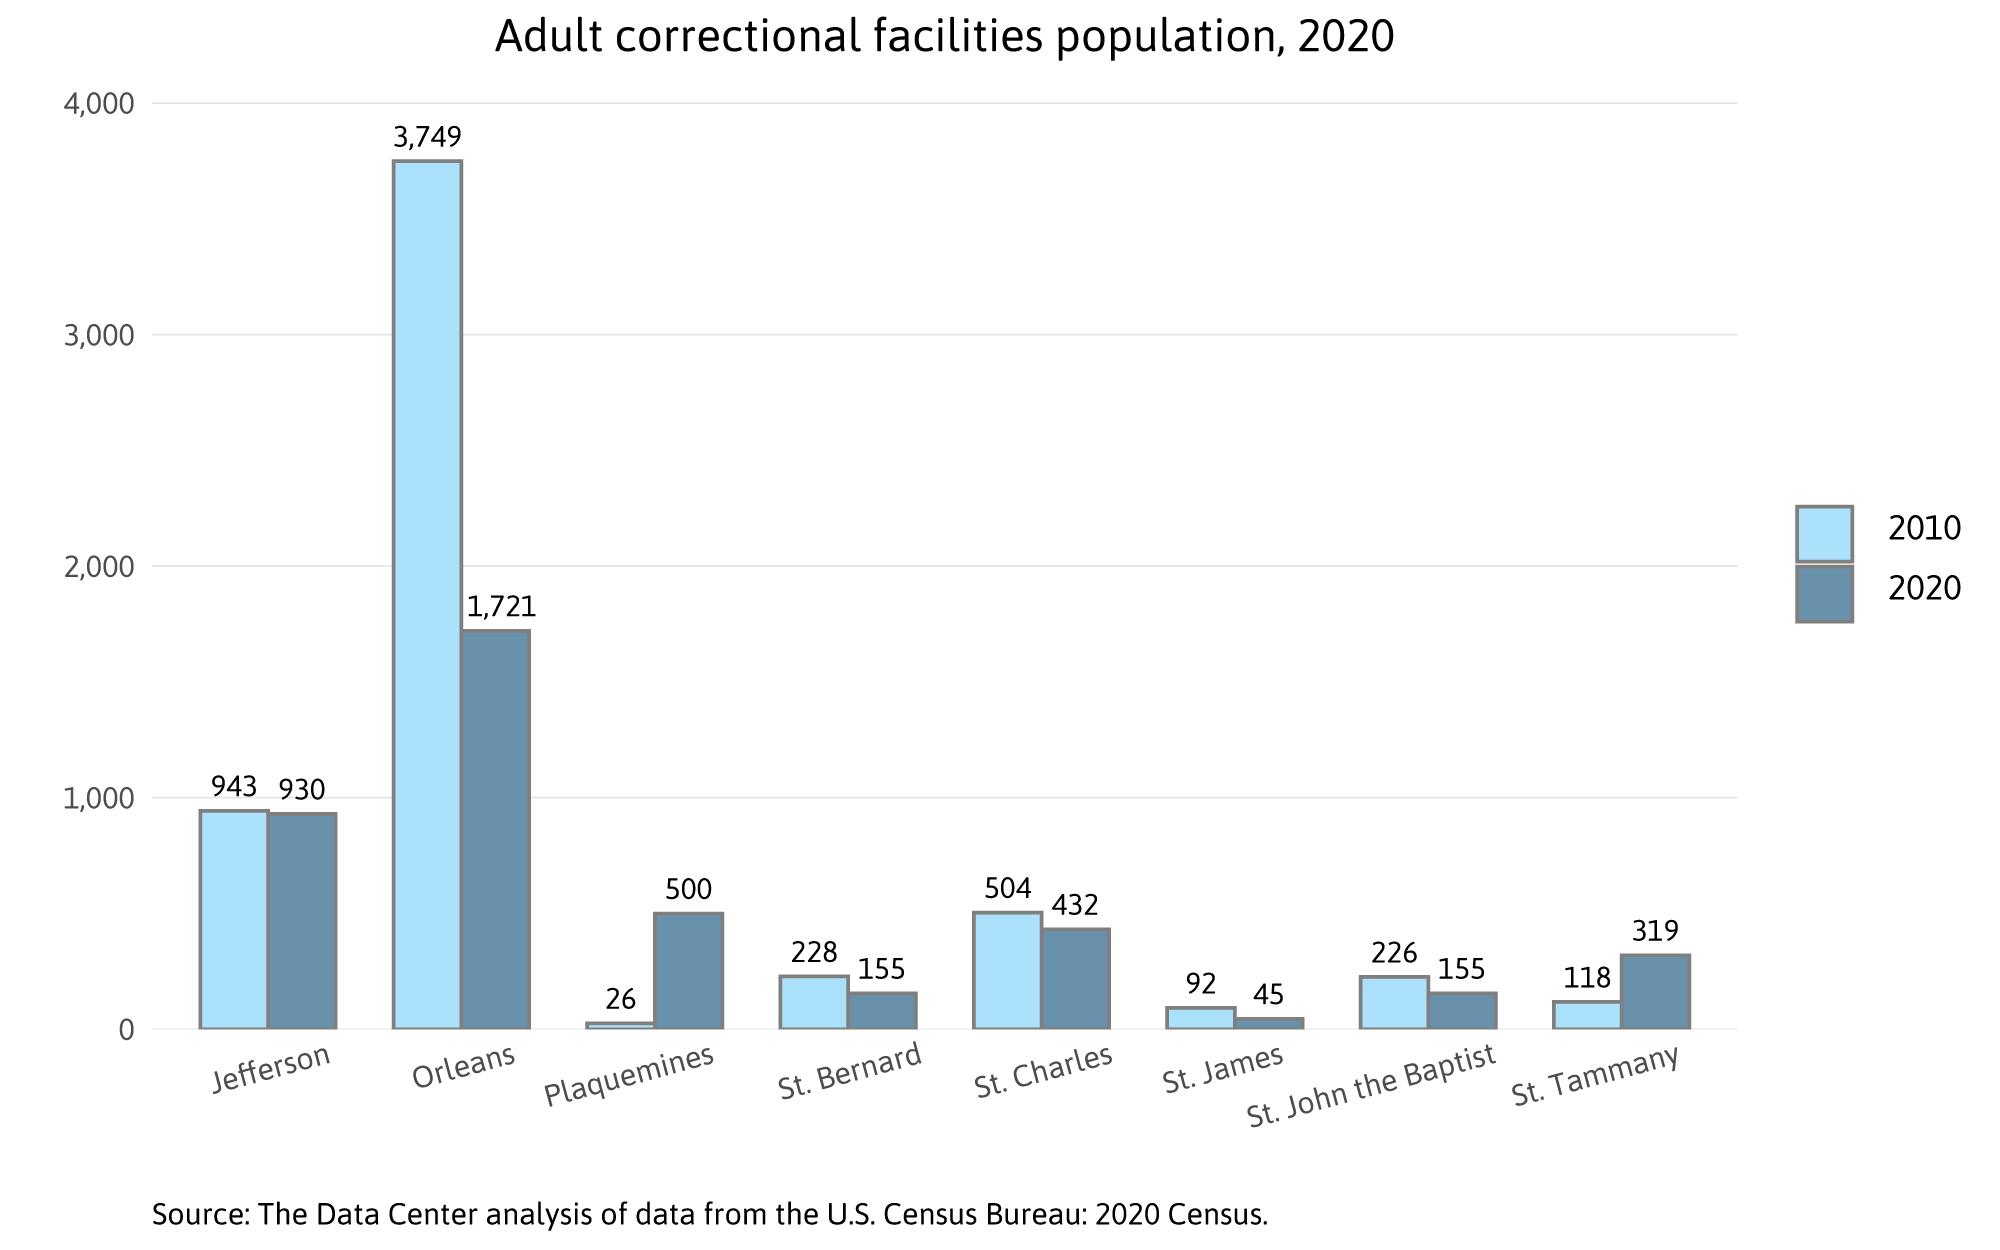 Adult correctional facilities